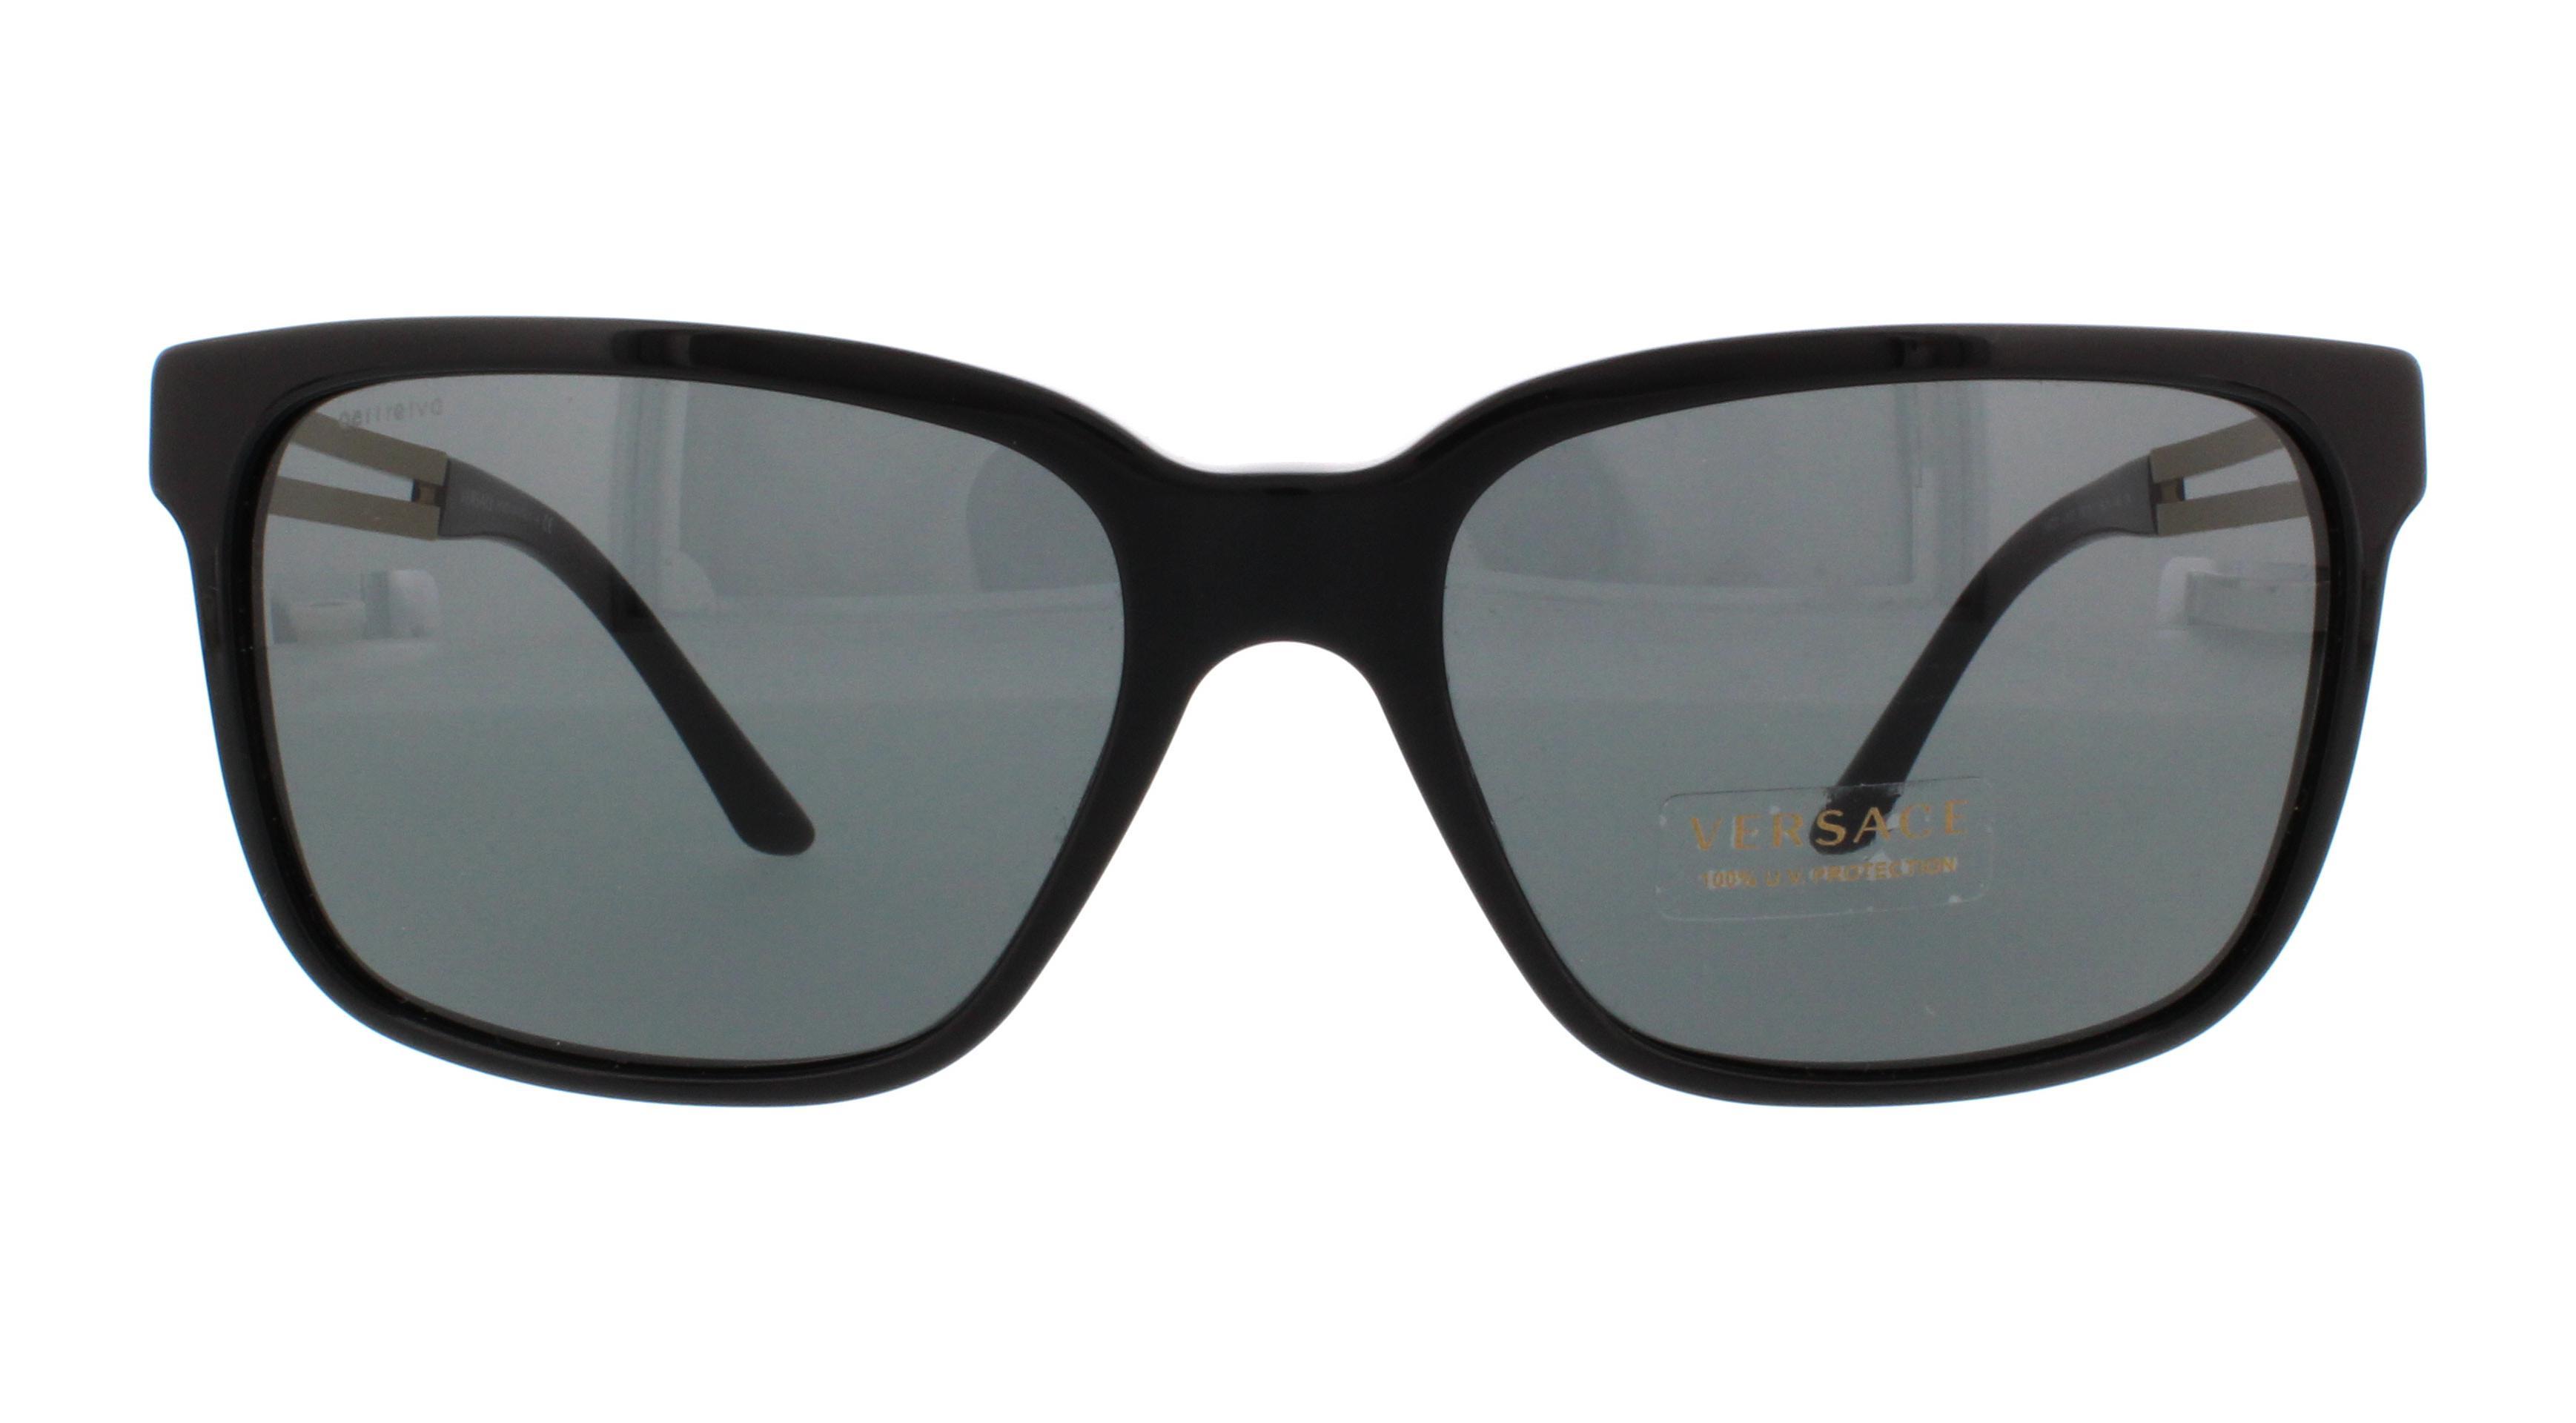 c0234ffcad0 VERSACE Sunglasses VE4307 GB1 87 Black 58MM 8053672469950